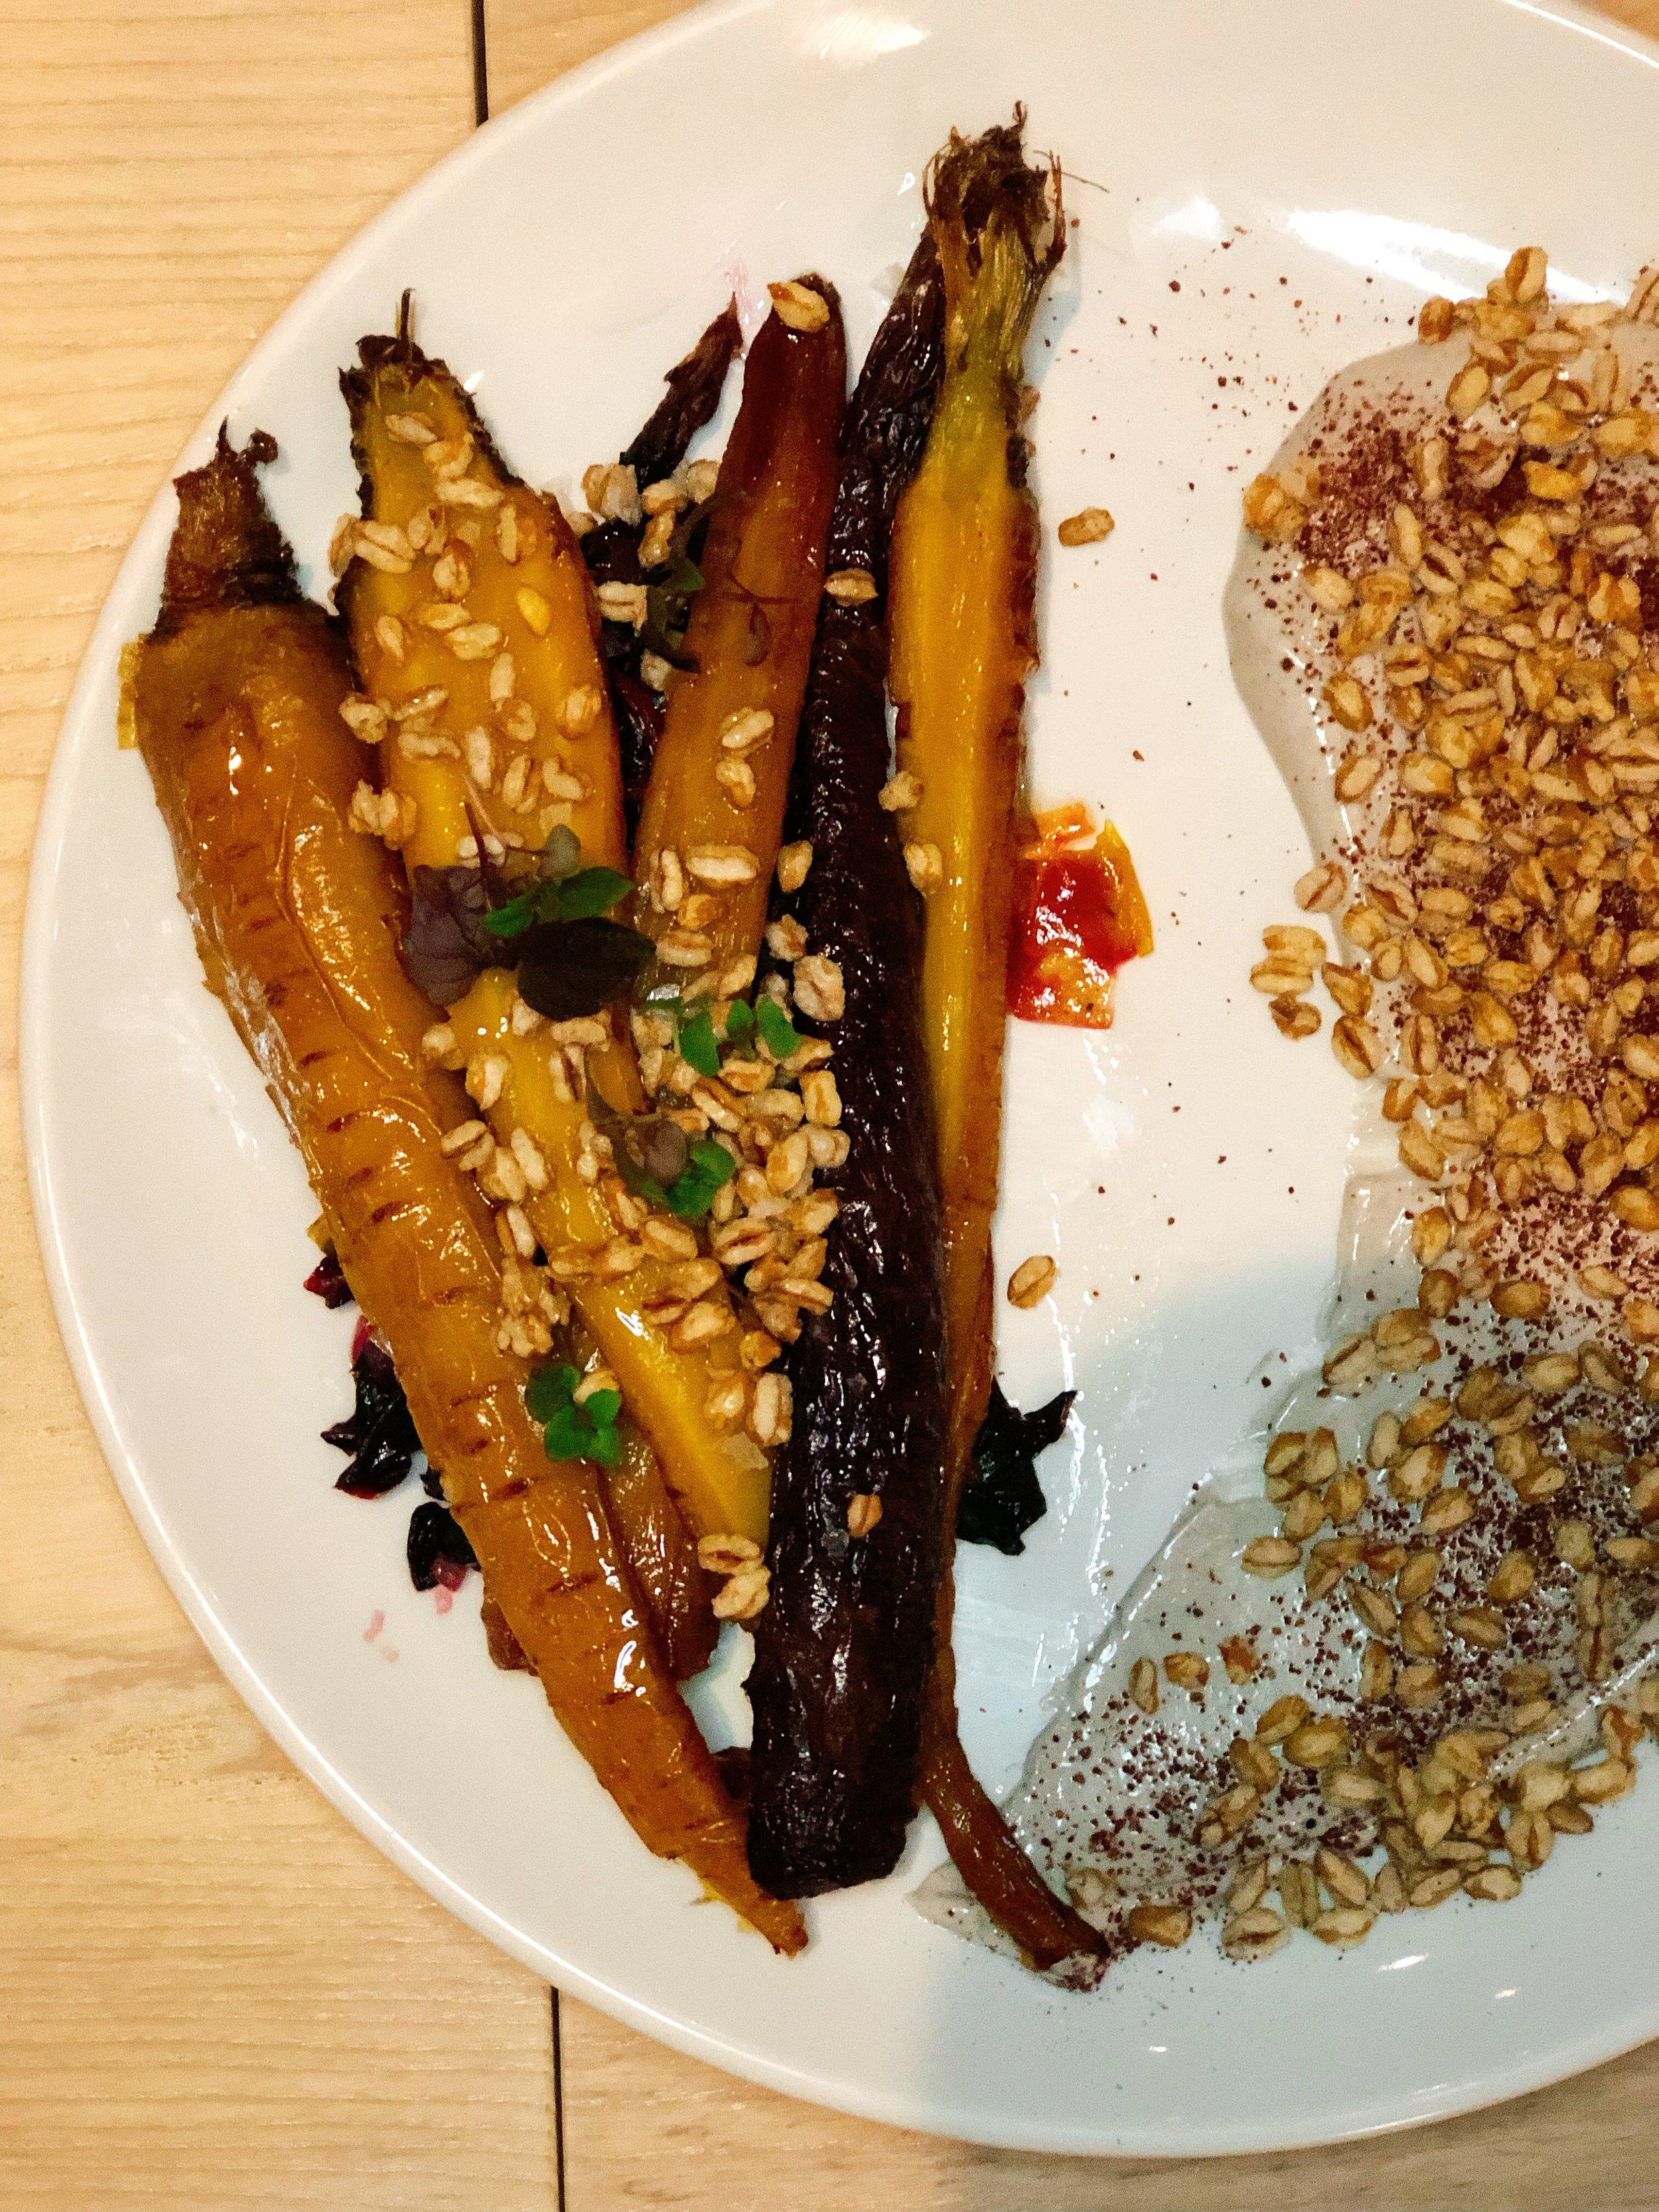 Roasted Heirloom Carrots | Chard + Puffed Grain + Mayu + Yogurt